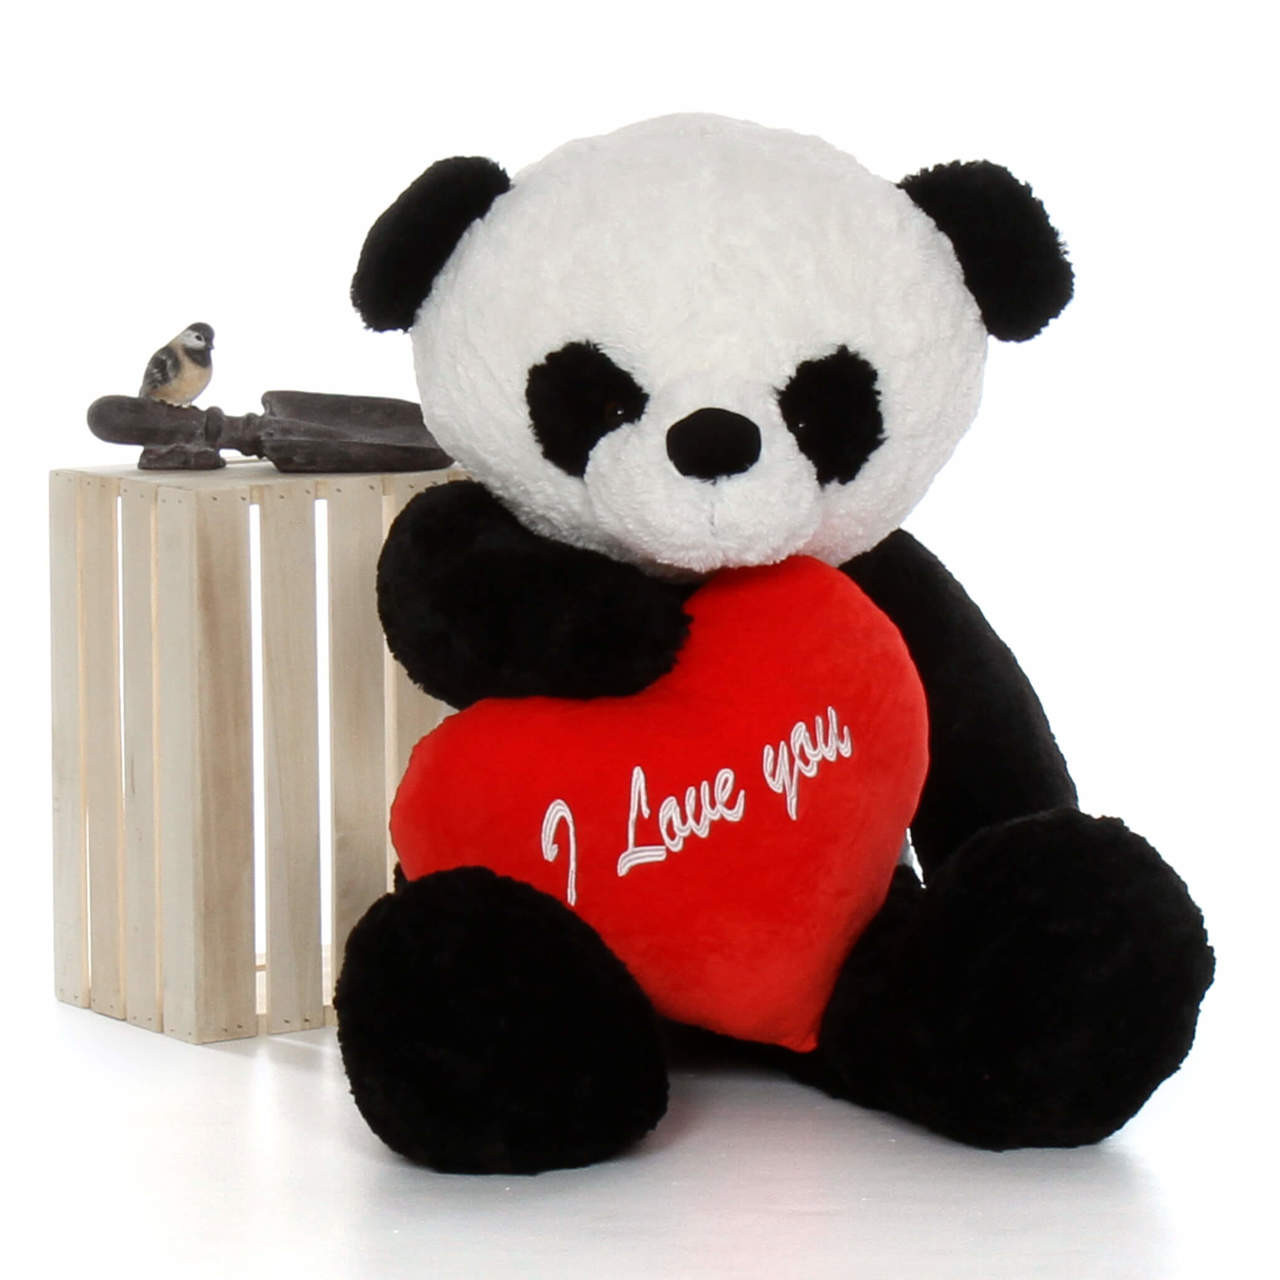 Giant Teddy 4ft Life Size Panda Bear WI Love You Heart